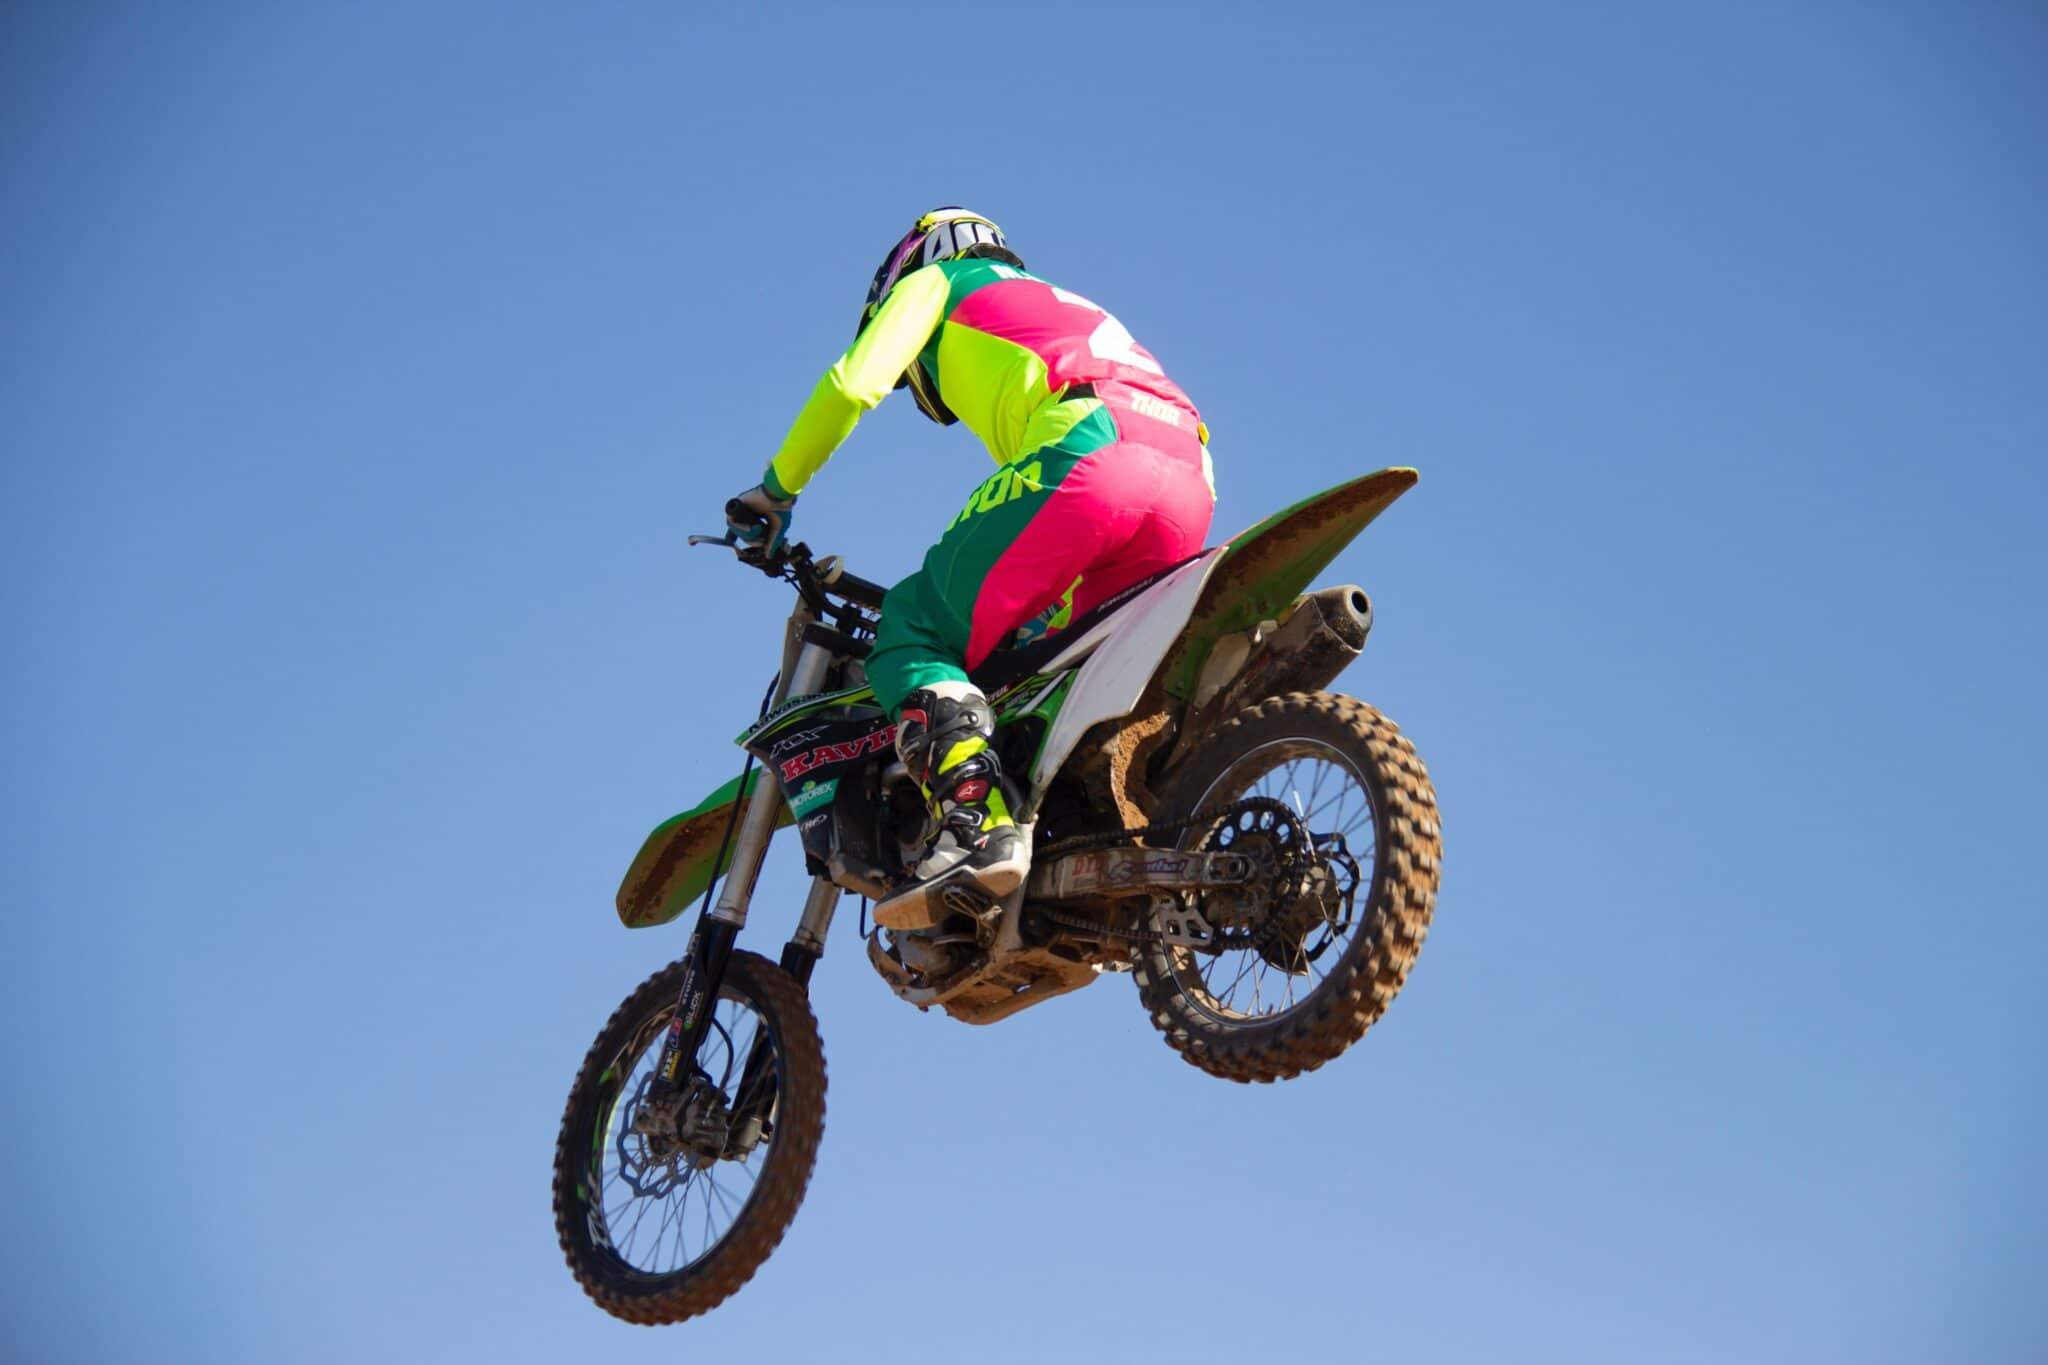 salto acrobatico moto sportiva su sfondo azzurro cielo